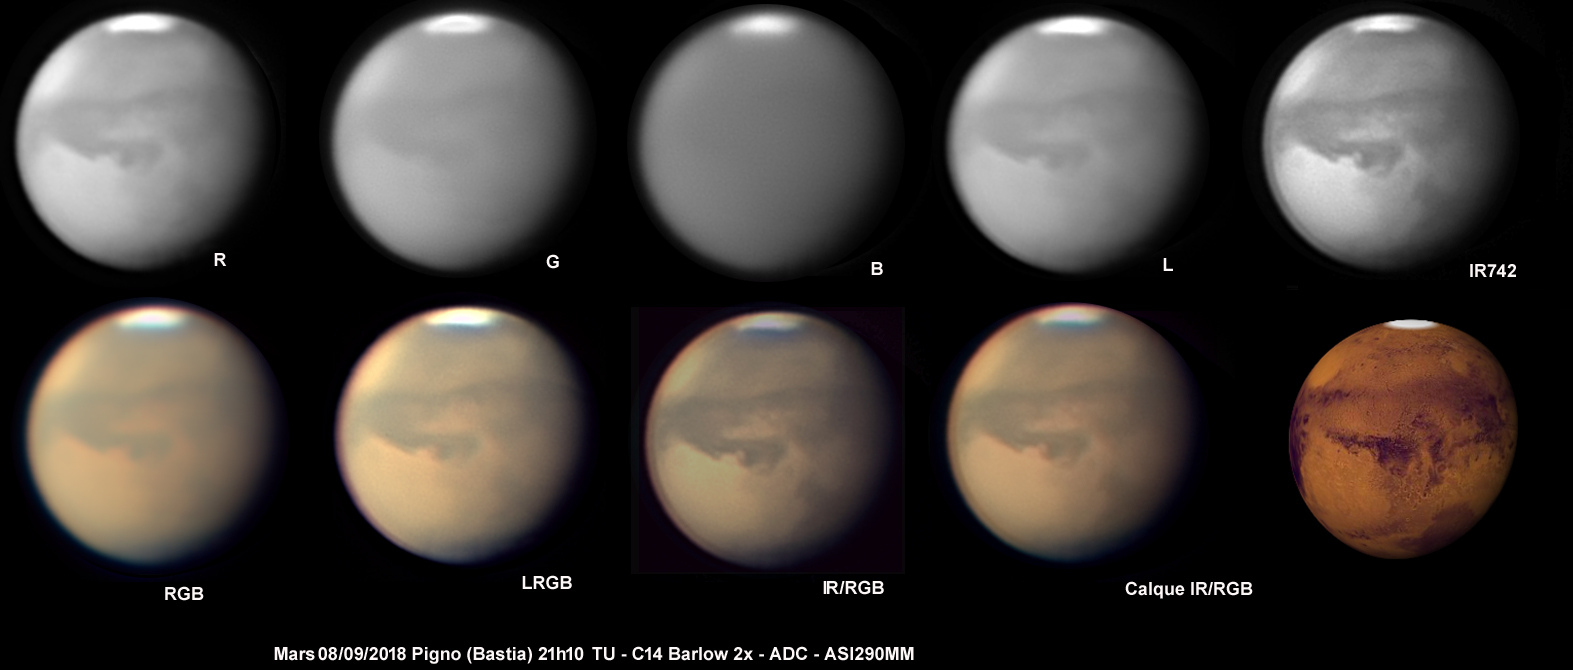 Mars-08-09-2018-planche1bmp.jpg